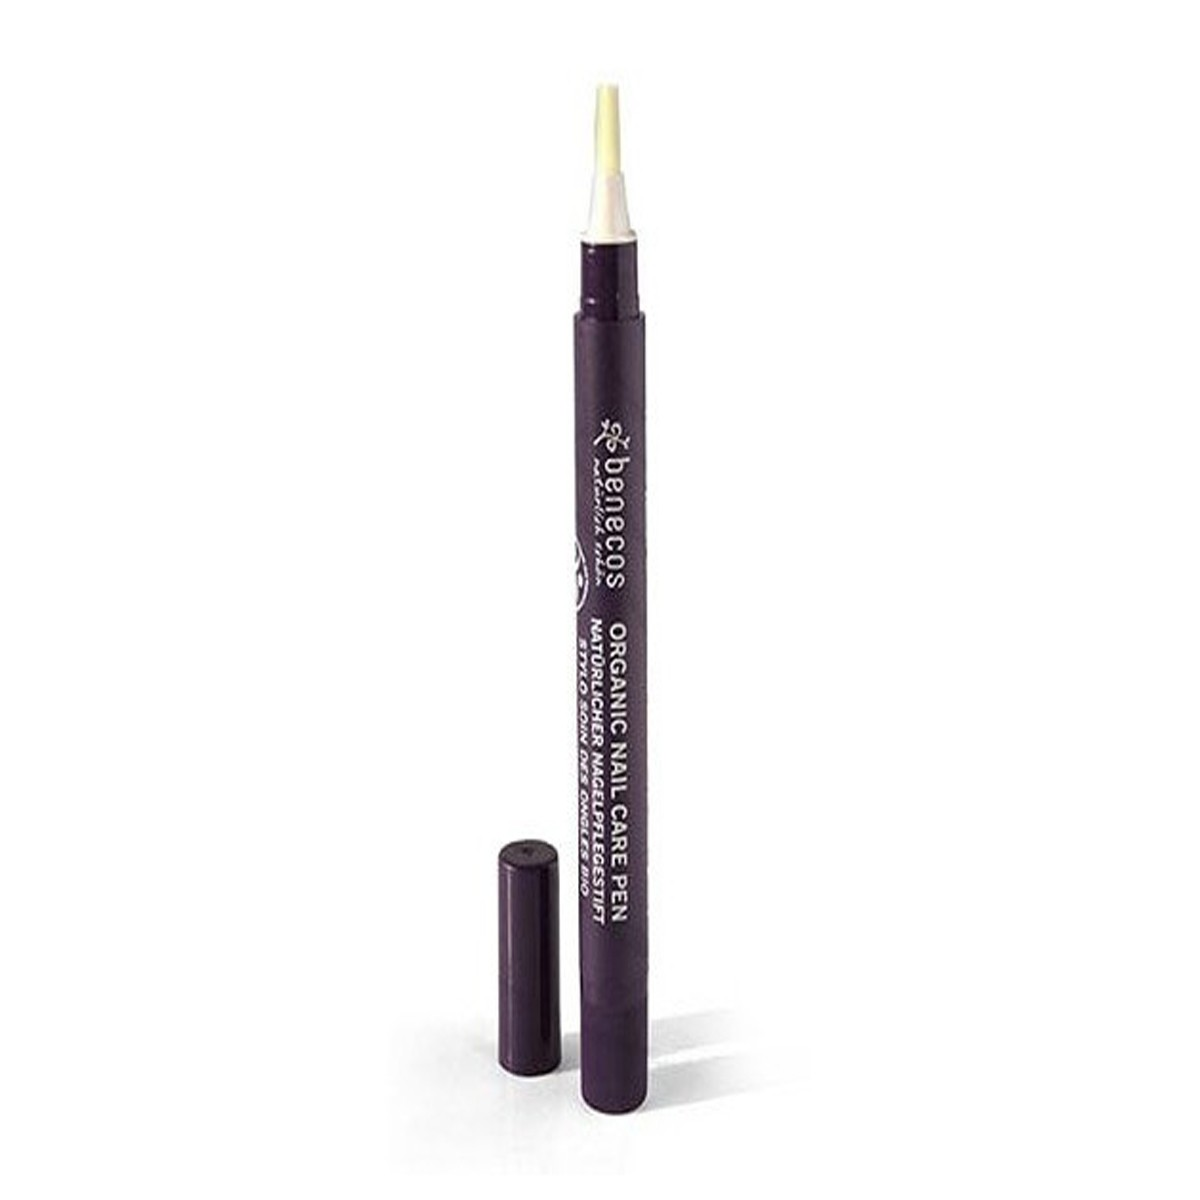 Benecos Natural Nail Cuticle Care Pen